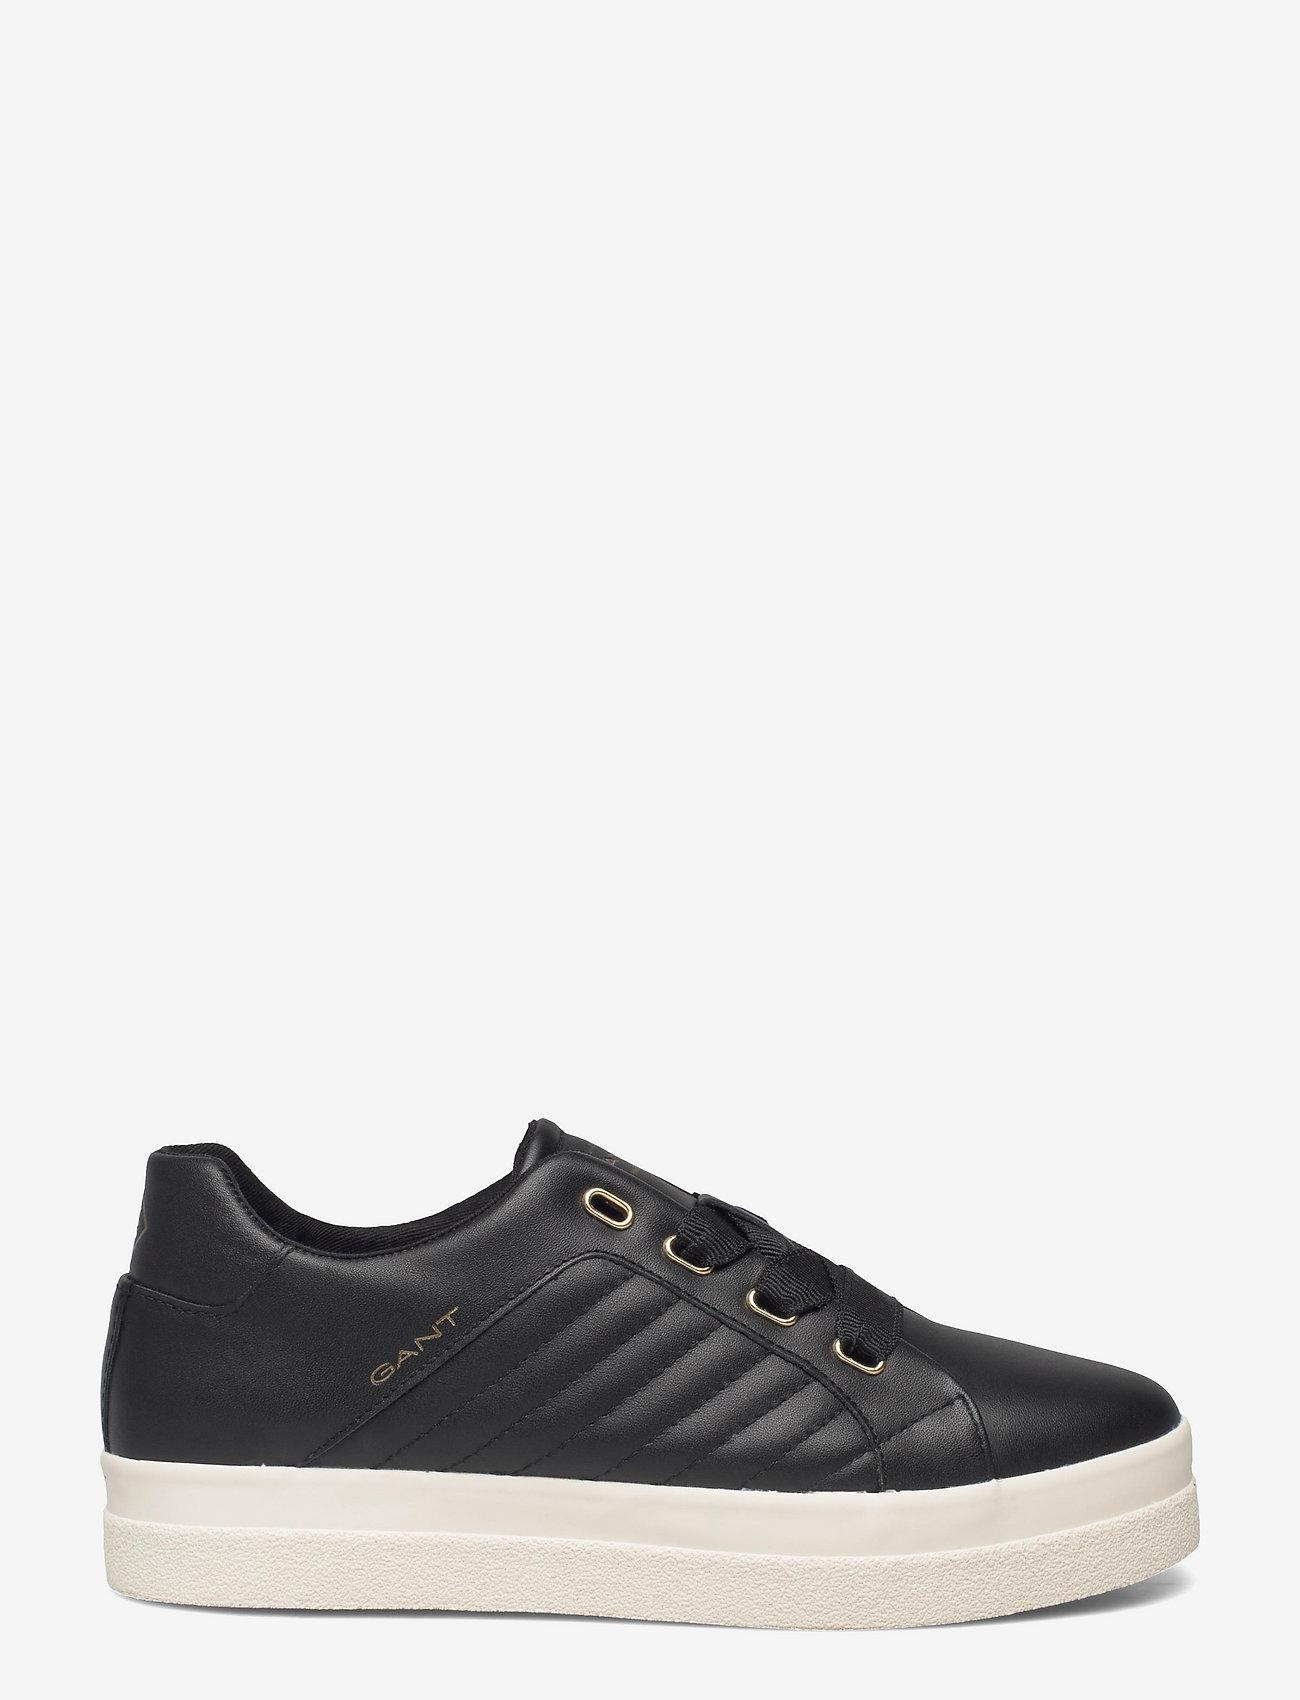 GANT - Avona Low lace shoes - low top sneakers - black - 1